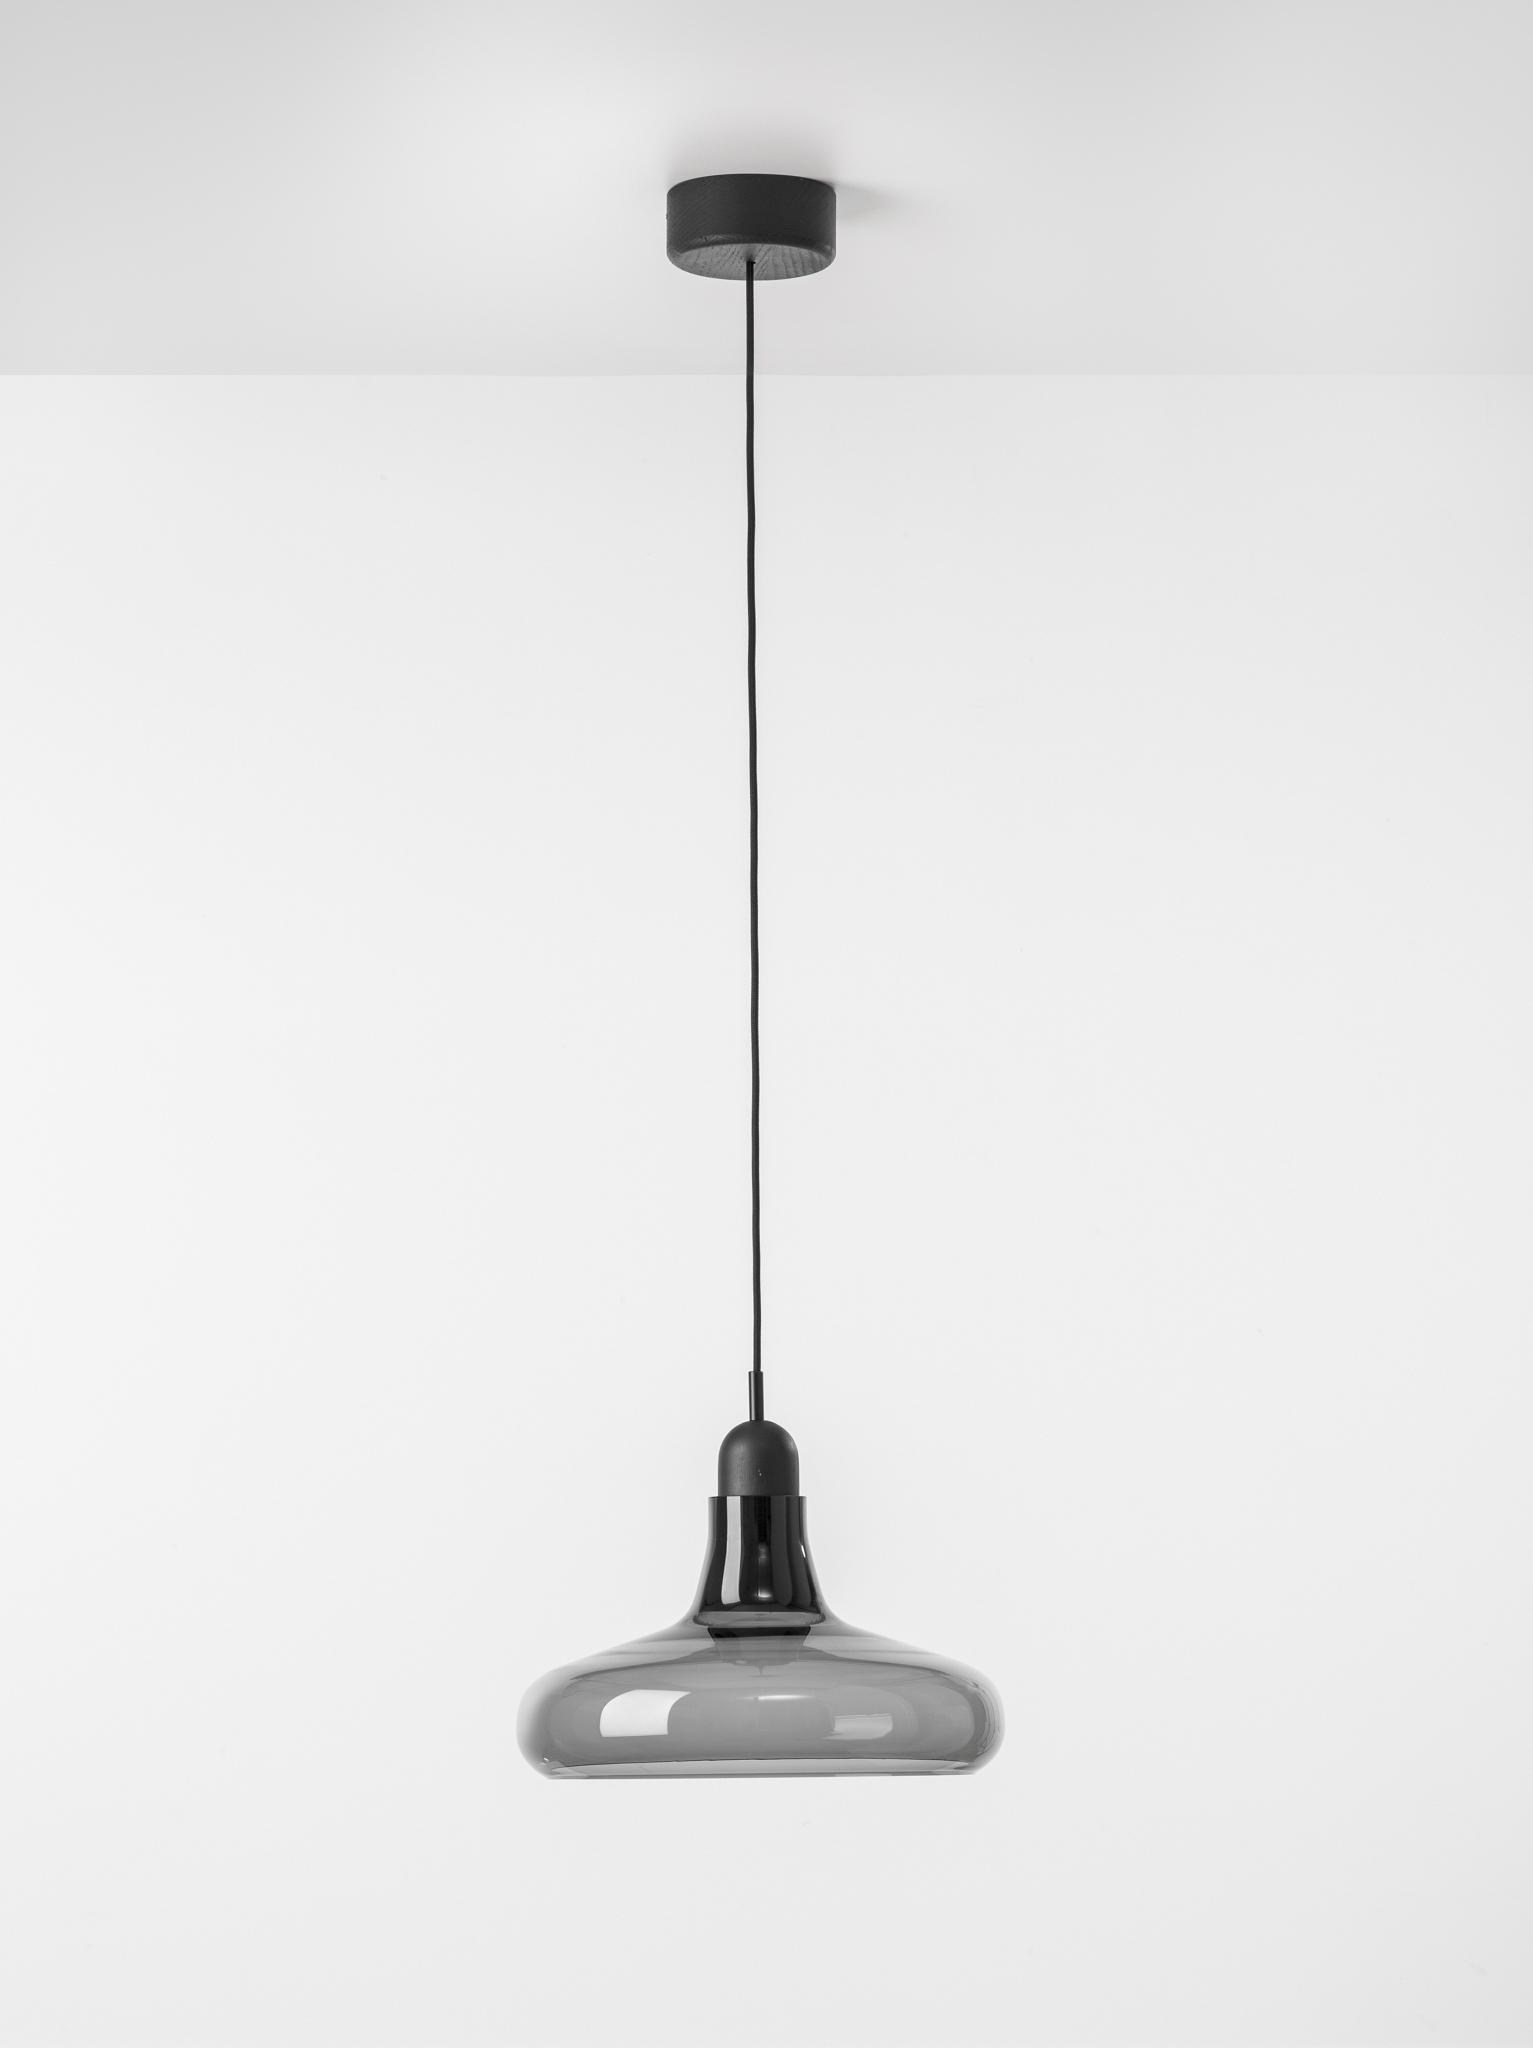 Dan Yeffet & Lucie Koldova shadows xl pc911 & designer furniture | architonic